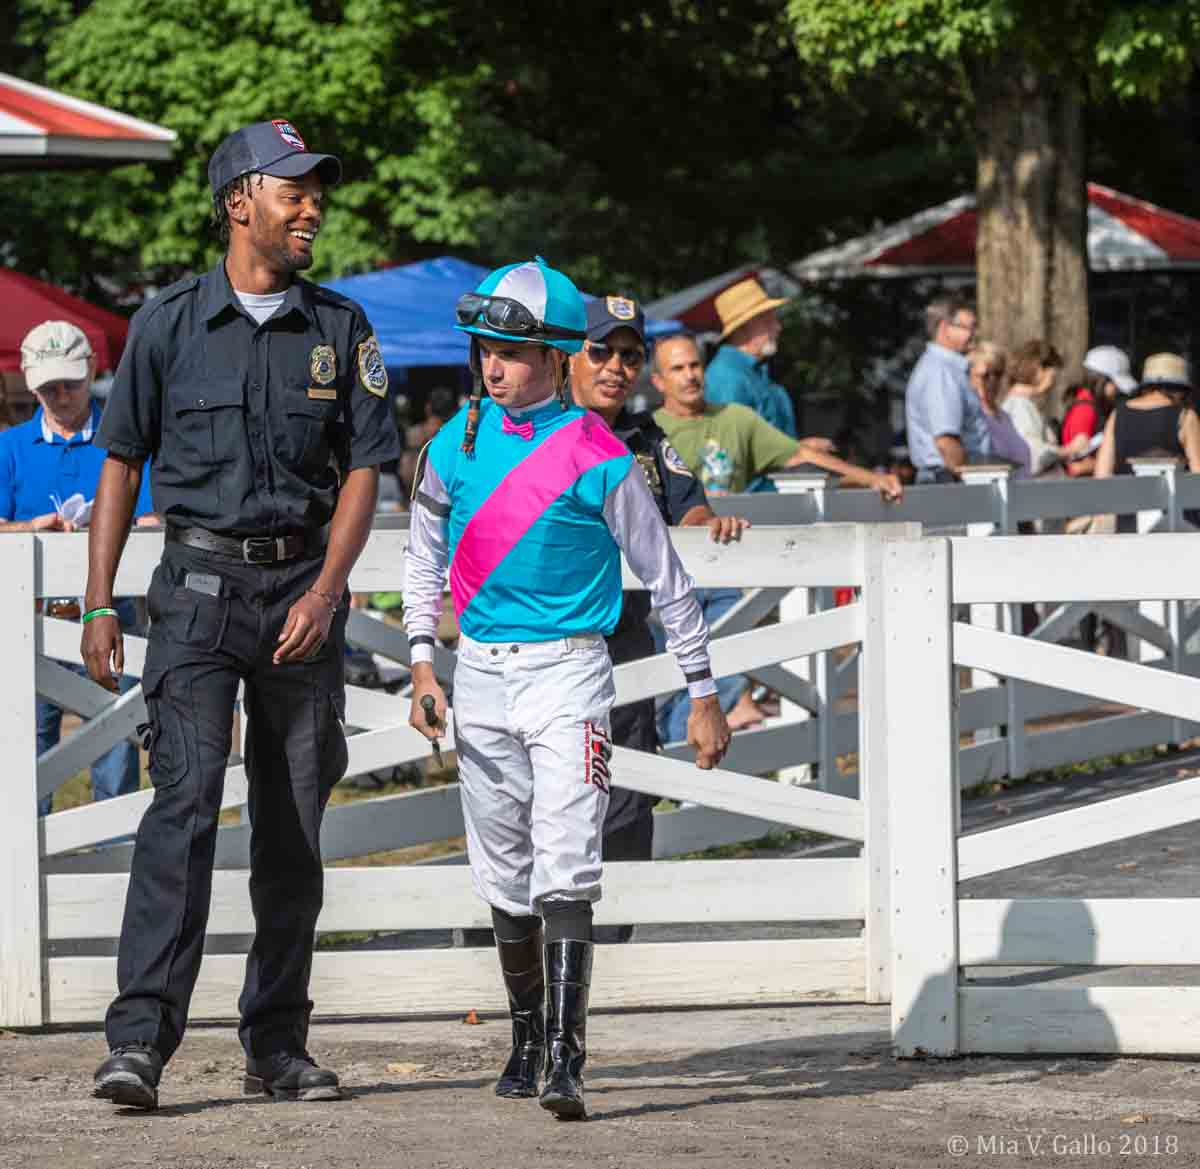 2018 Alabama Bound race - TJG jockey-3095.jpg